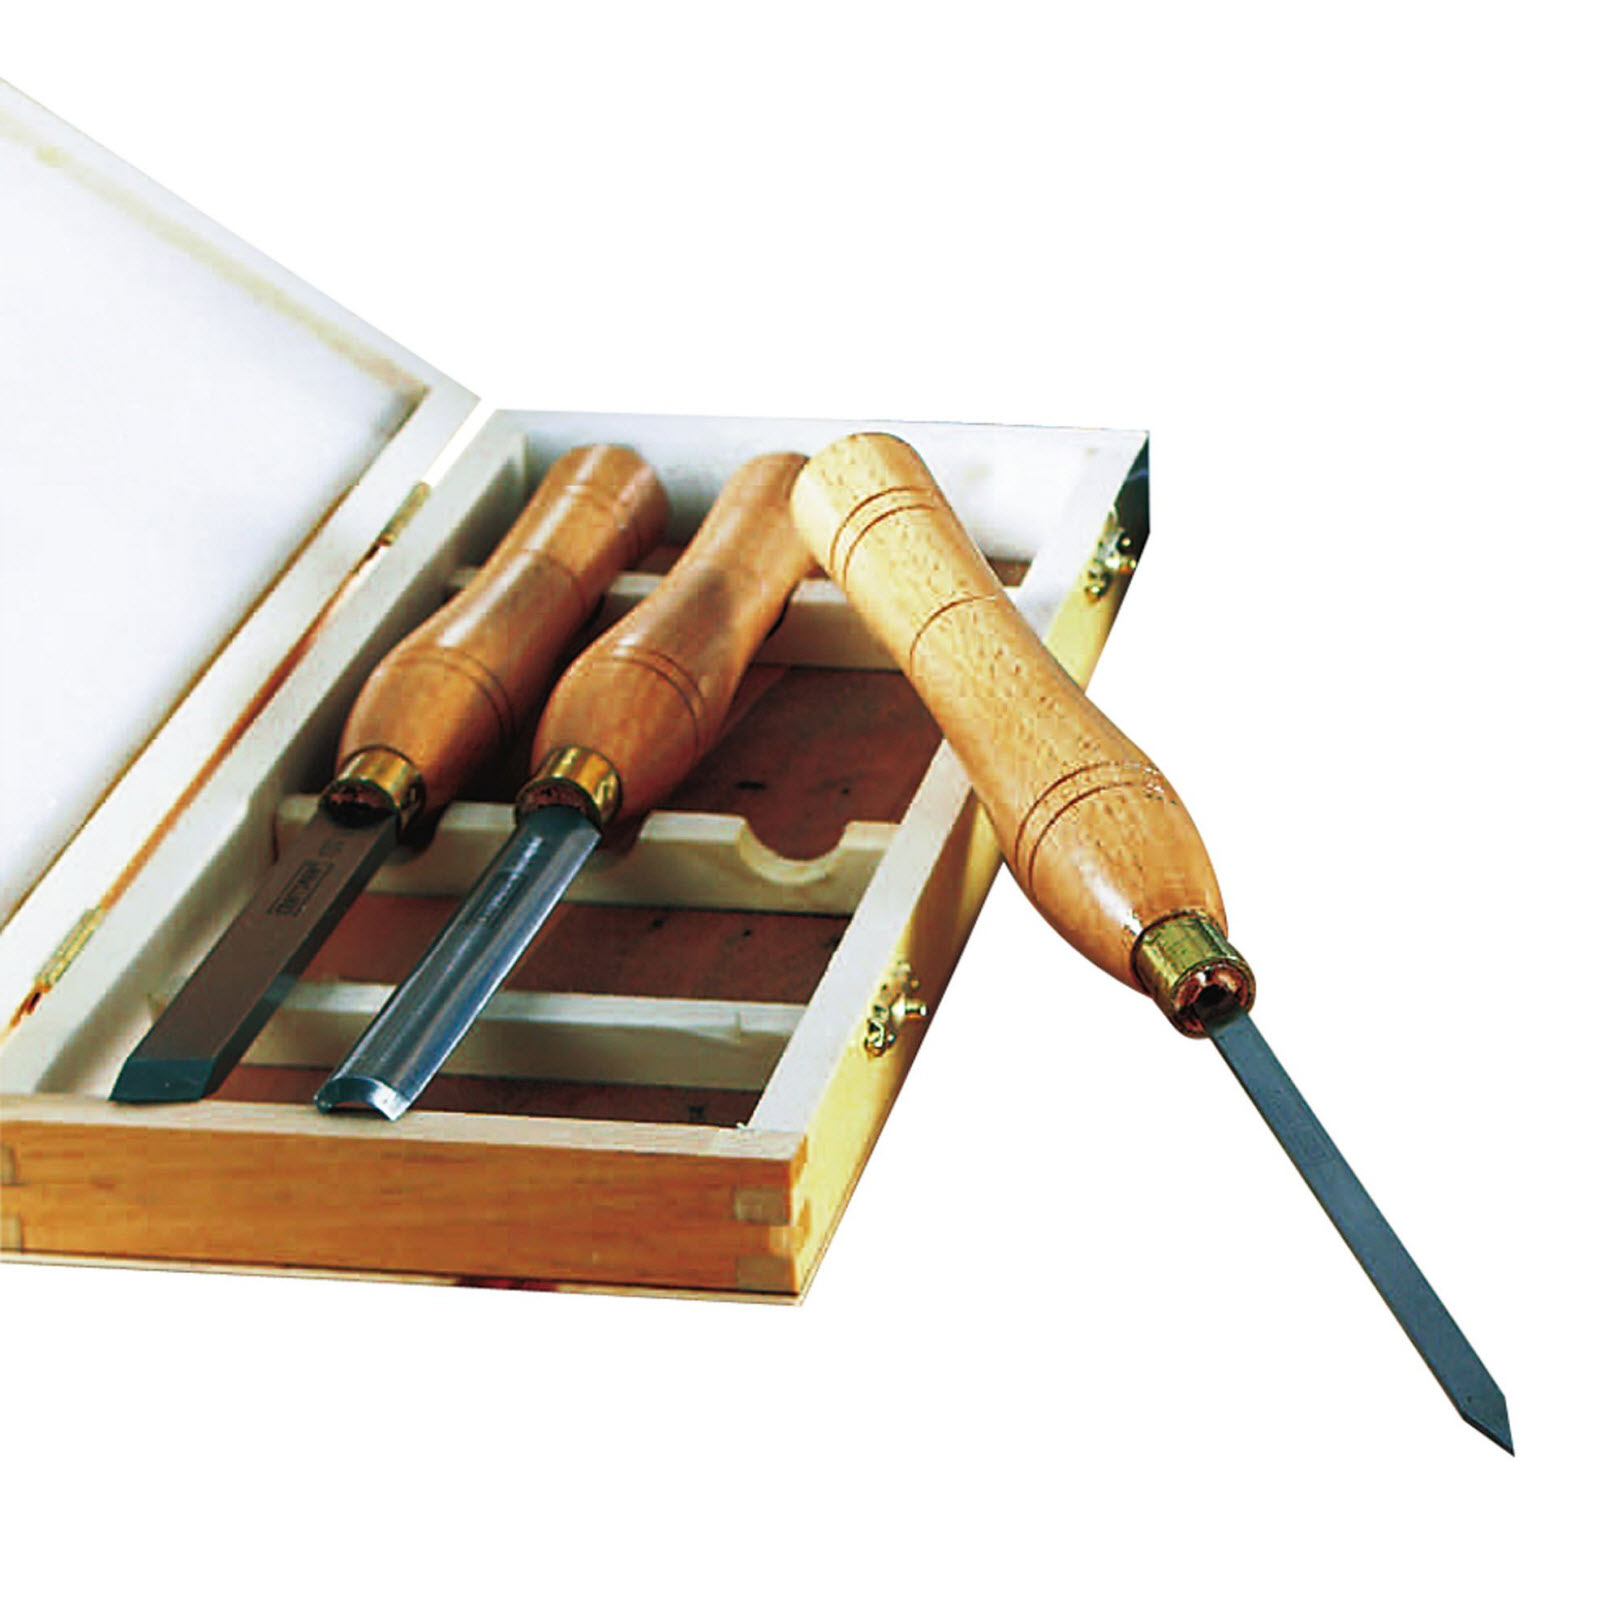 Craftsman Mini Lathe with Bonus 3 pc. Mini Turning Set